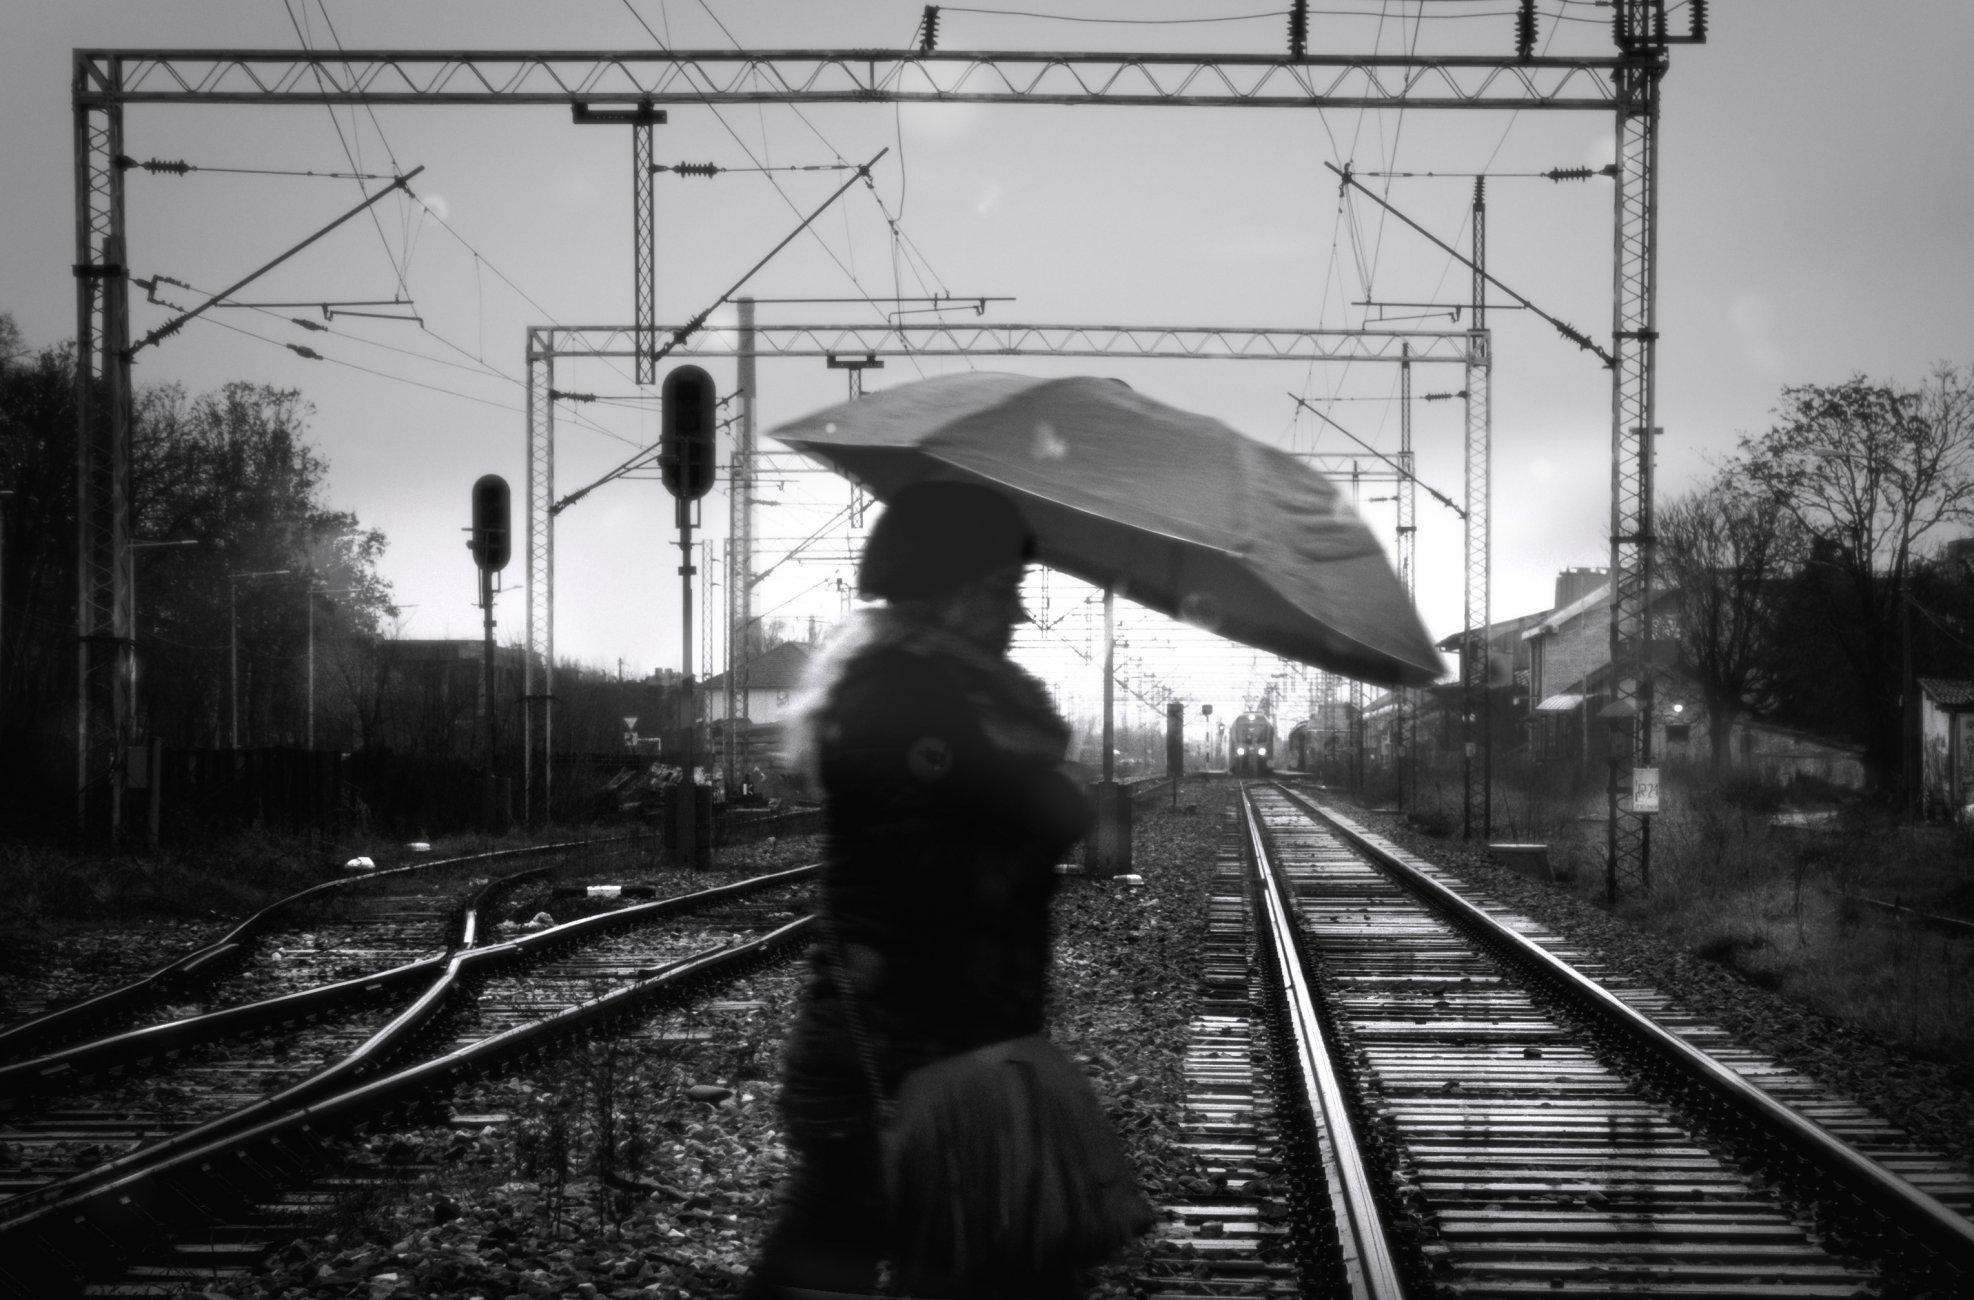 About the railway - XXXIV